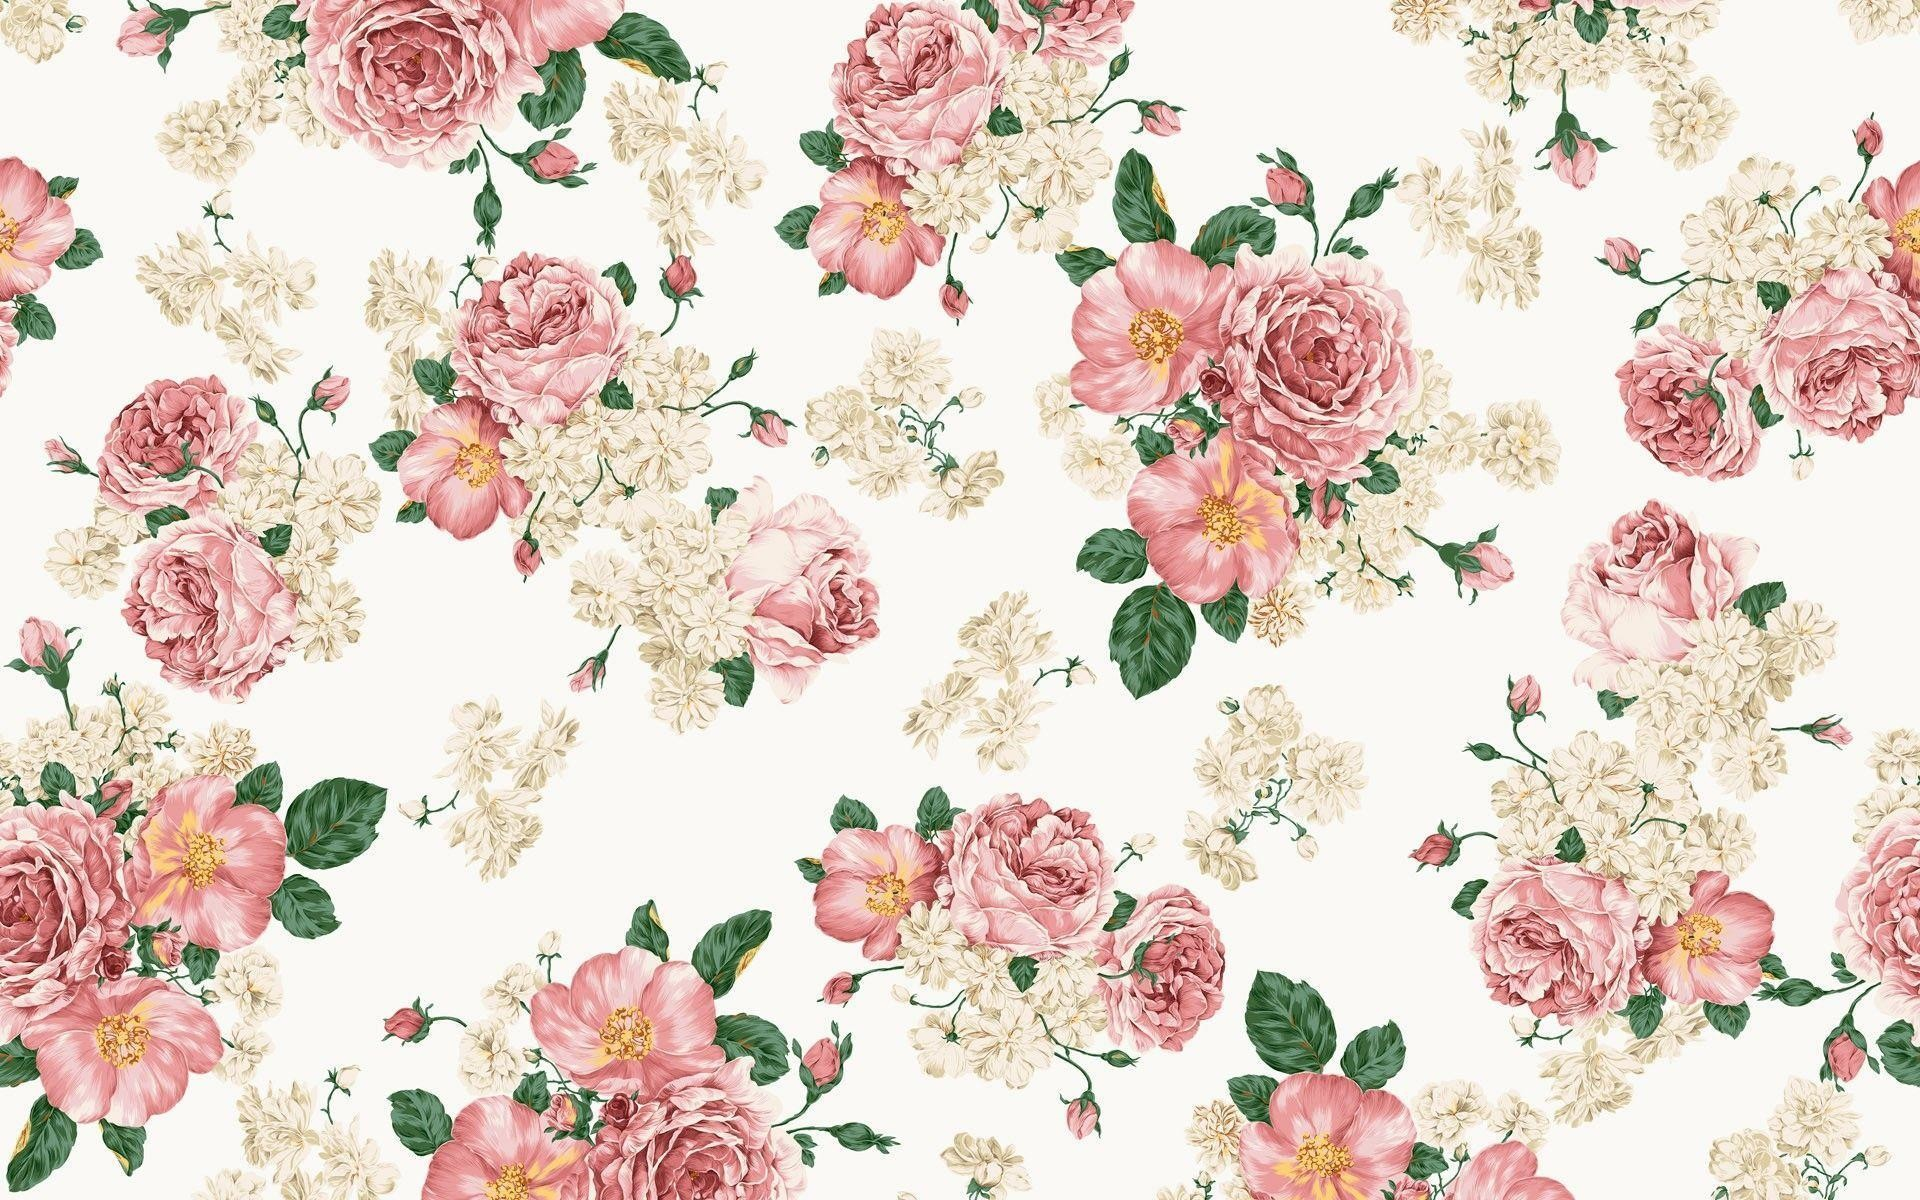 Floral Desktop Wallpaper 64 Pictures